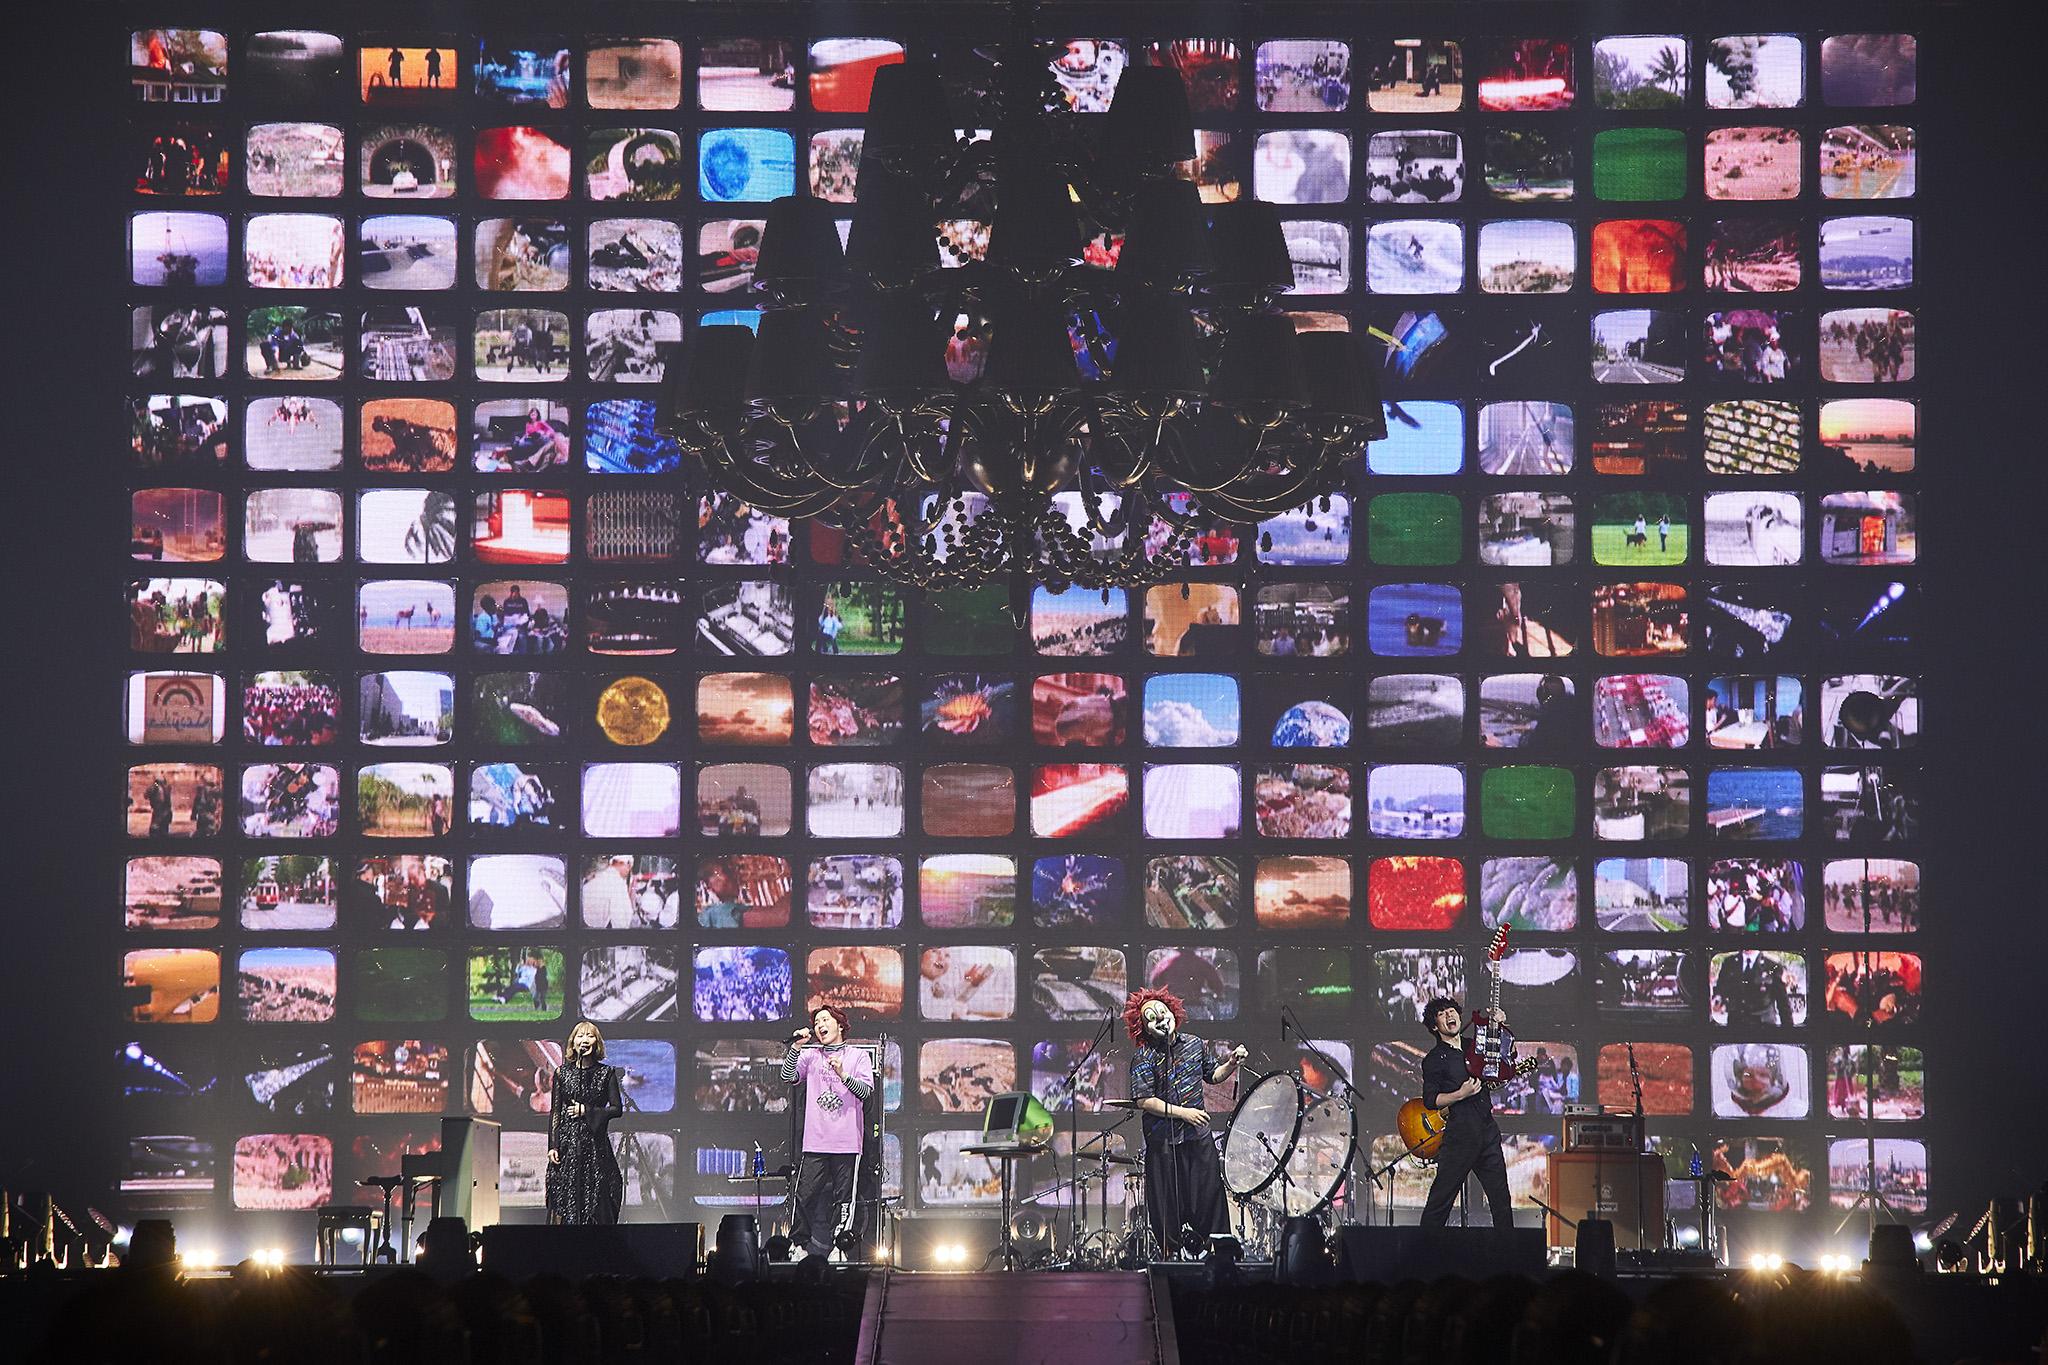 【SEKAI NO OWARI ライヴレポート】『SEKAI NO OWARI TOUR 2019「The Colors」』2019年7月25日 at 幕張メッセ 国際展示場4〜6ホール